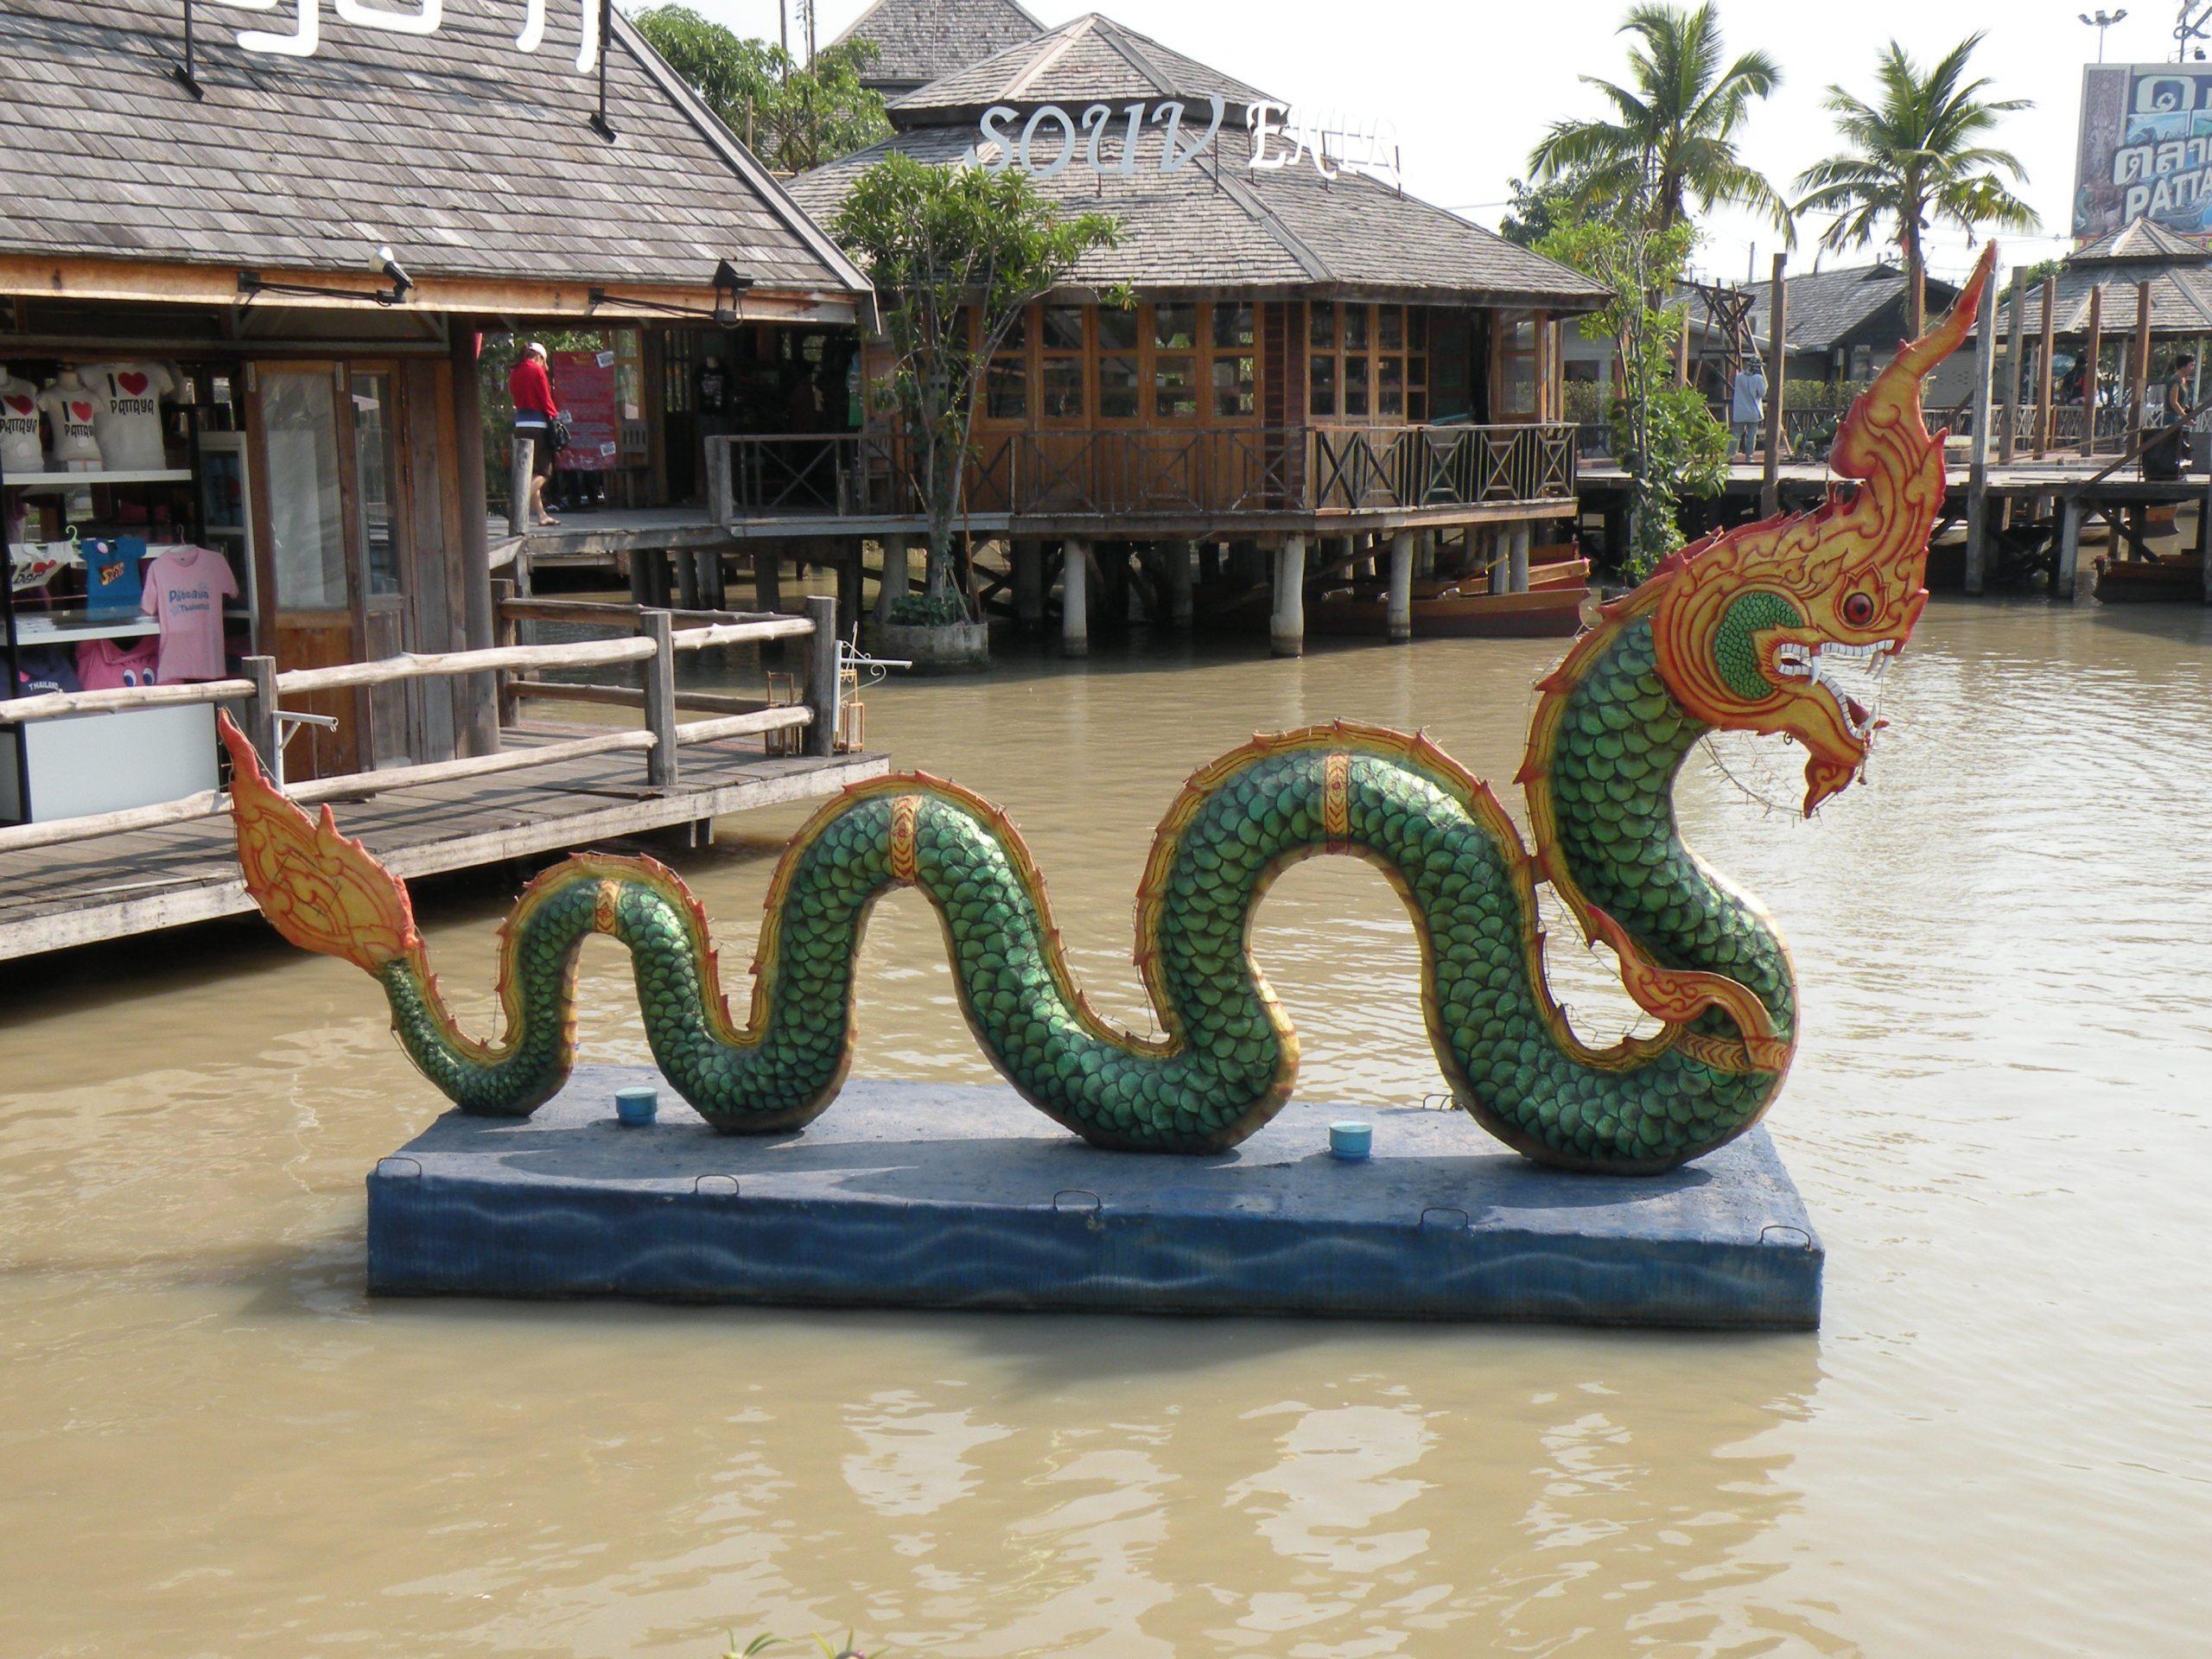 Floating market in Pataya, Thailand.